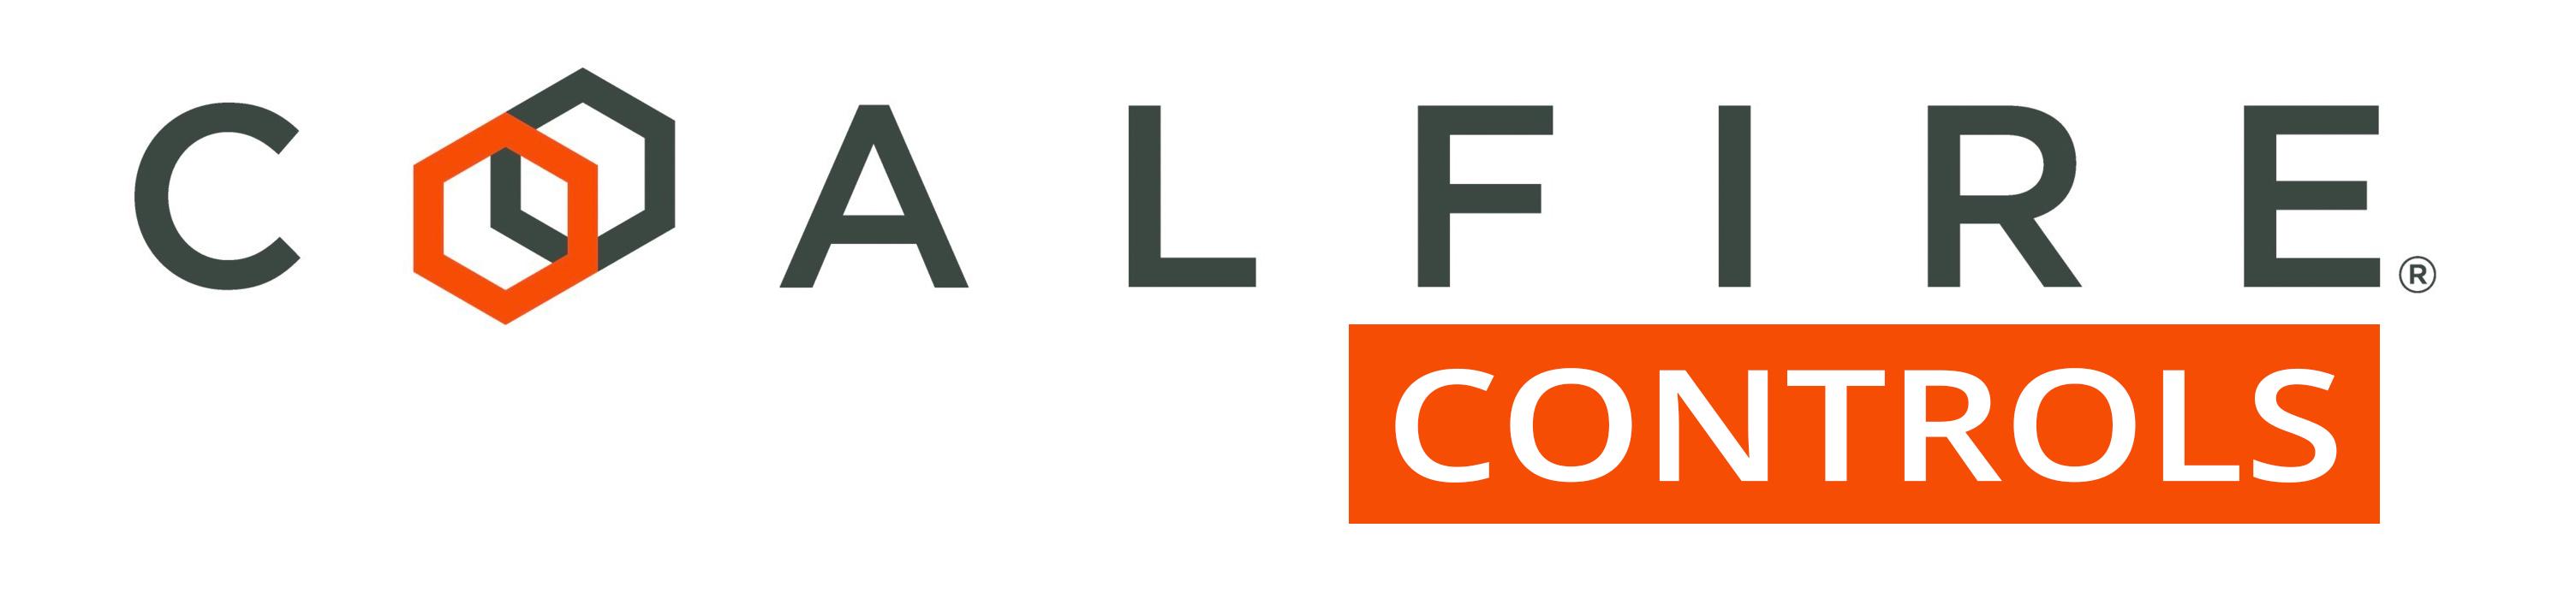 Coalfire Controls logo